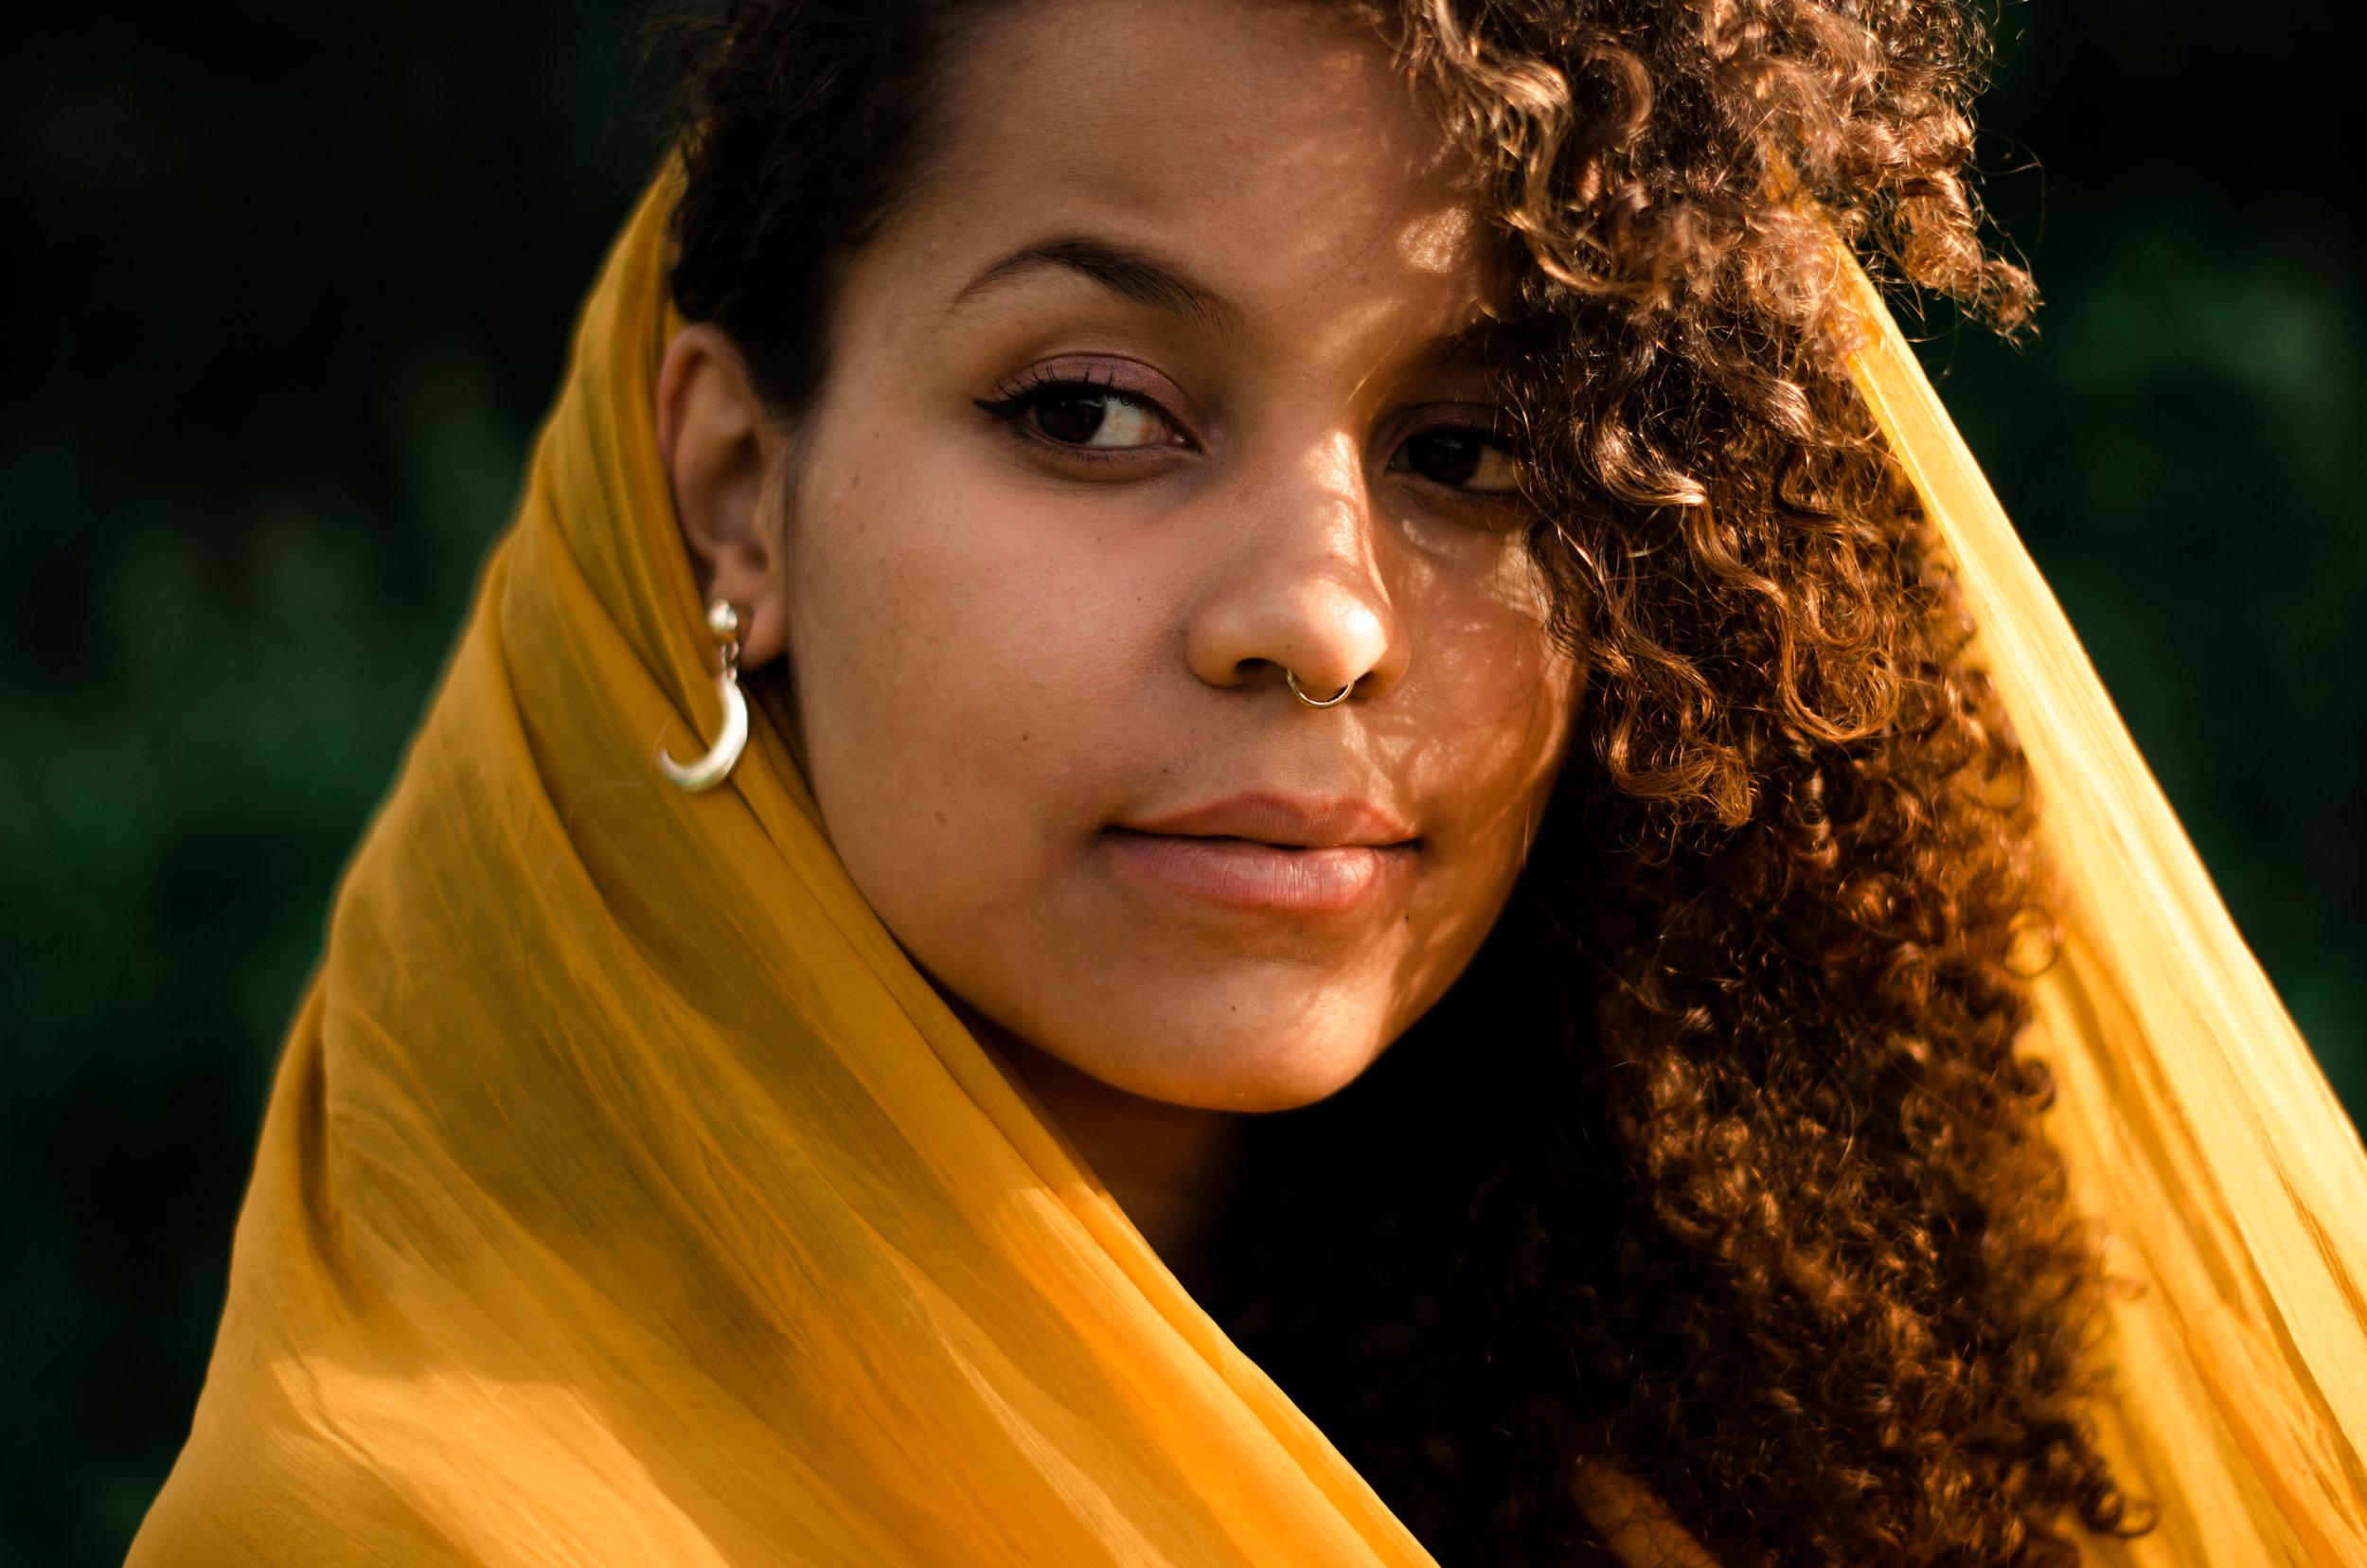 Inka-Portrait-Session-Aiste-Saulyte-Photography-17-07-30-37.jpg